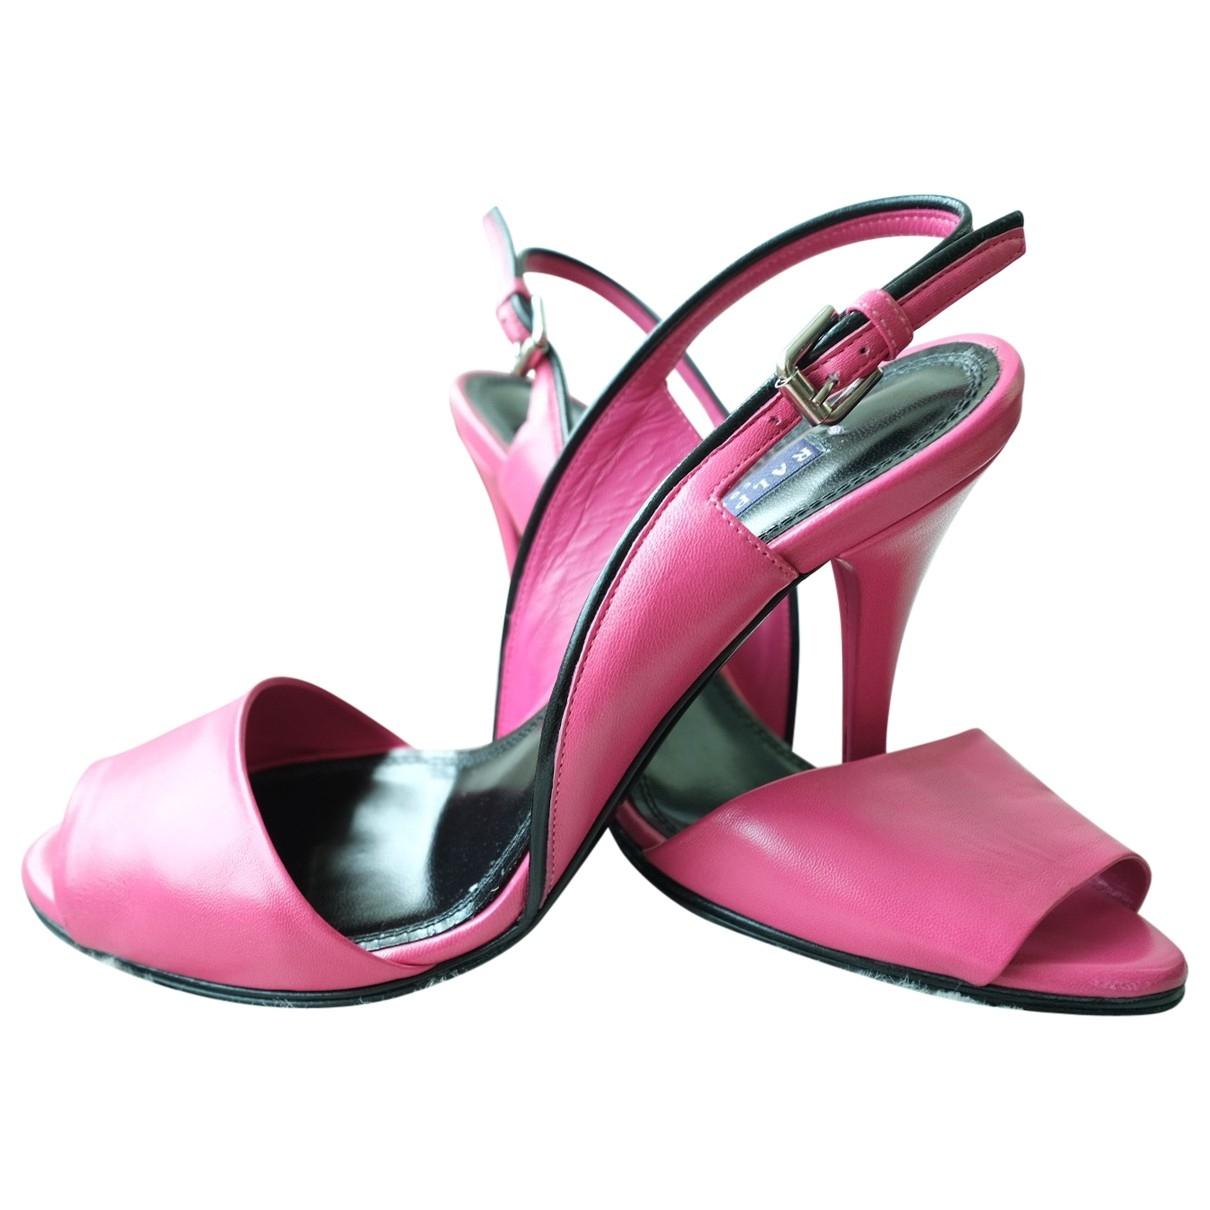 Ralph Lauren Collection \N Pink Leather Heels for Women 6.5 US